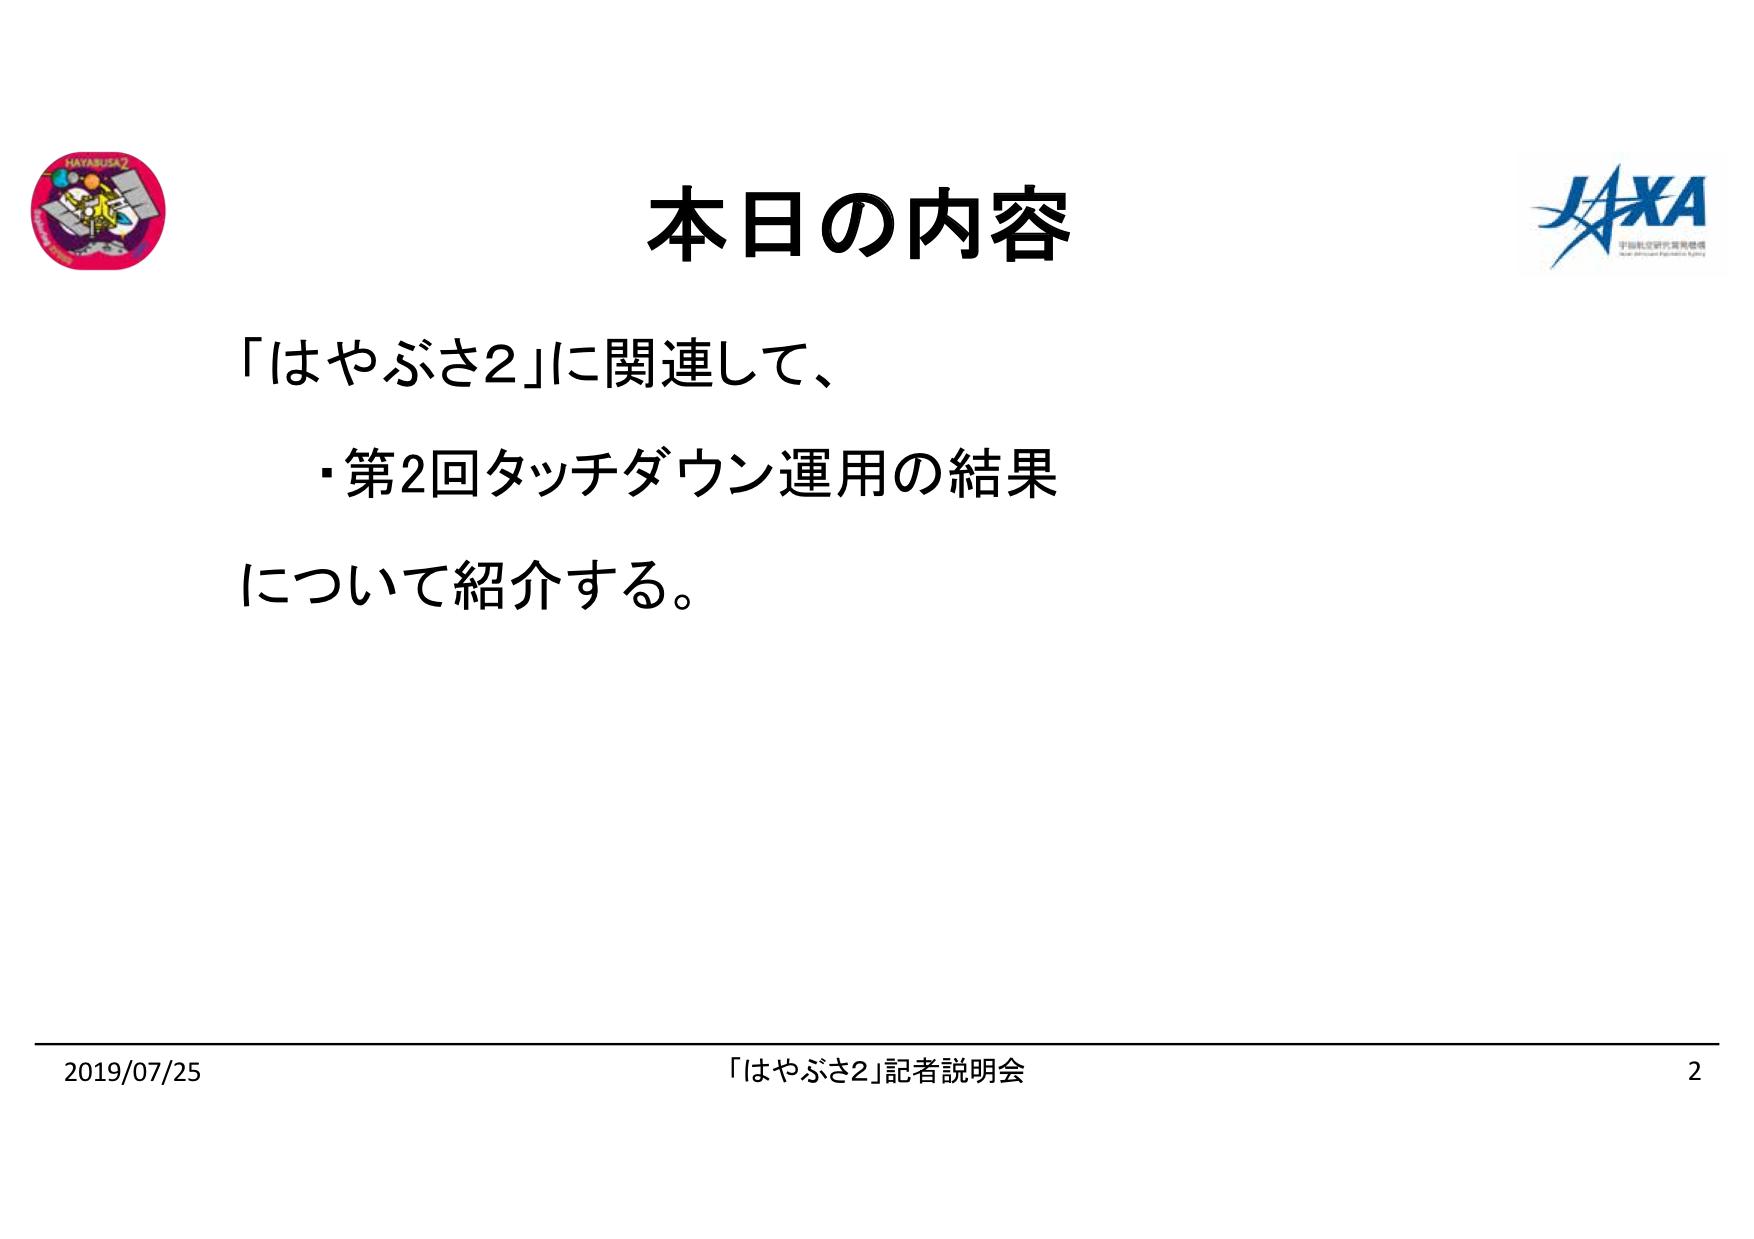 f:id:Imamura:20190725151041p:plain